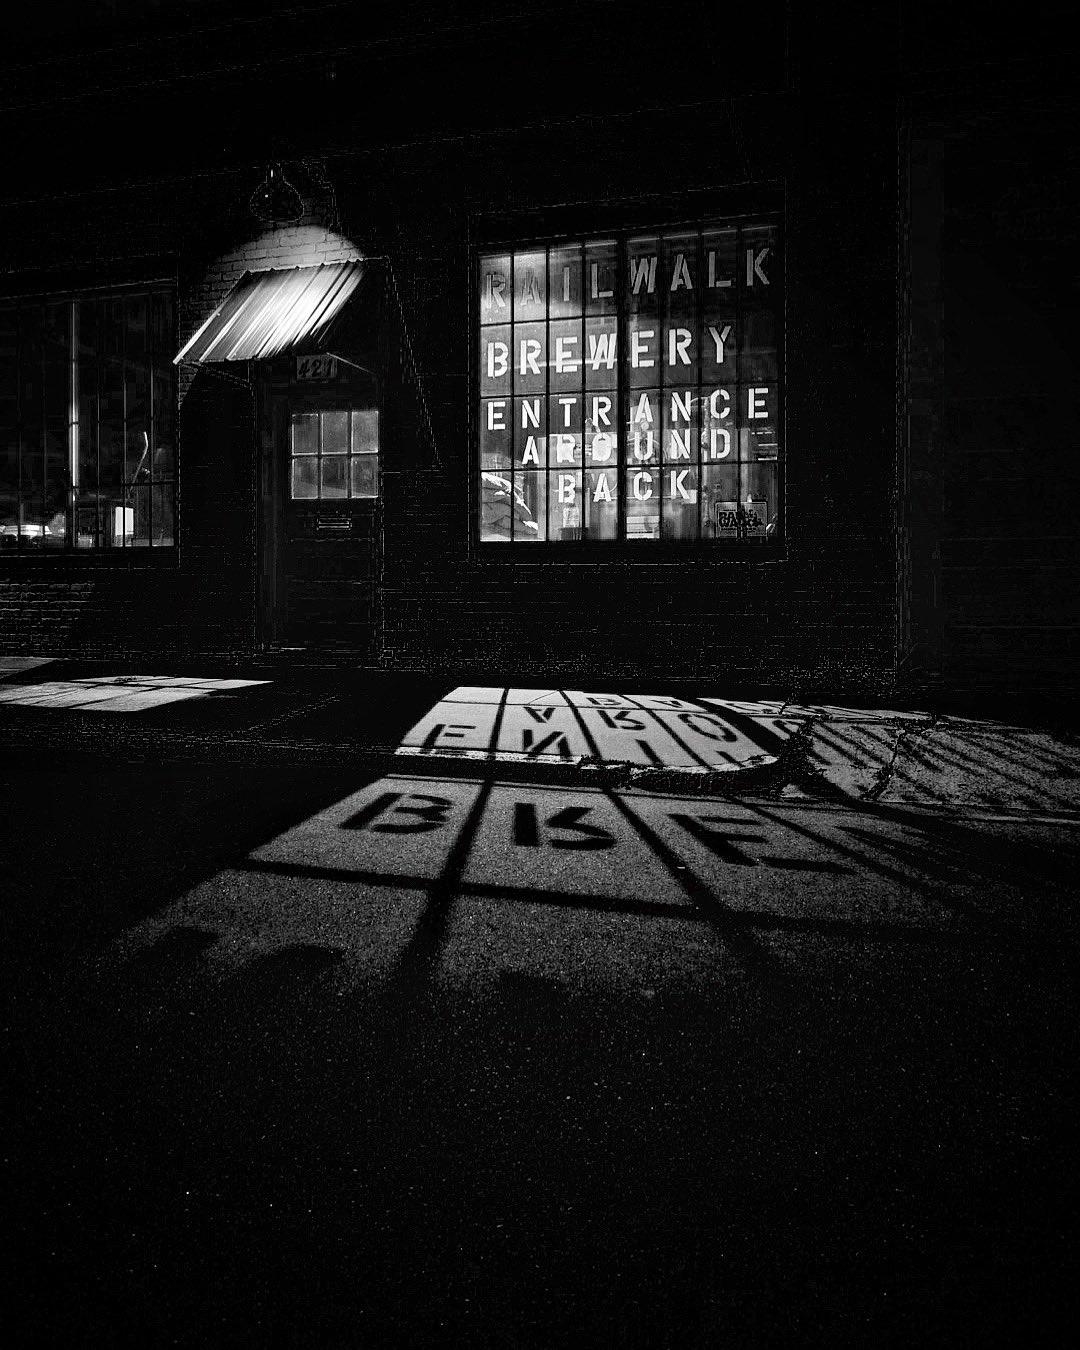 black_and_white_street_photography_1.jpg